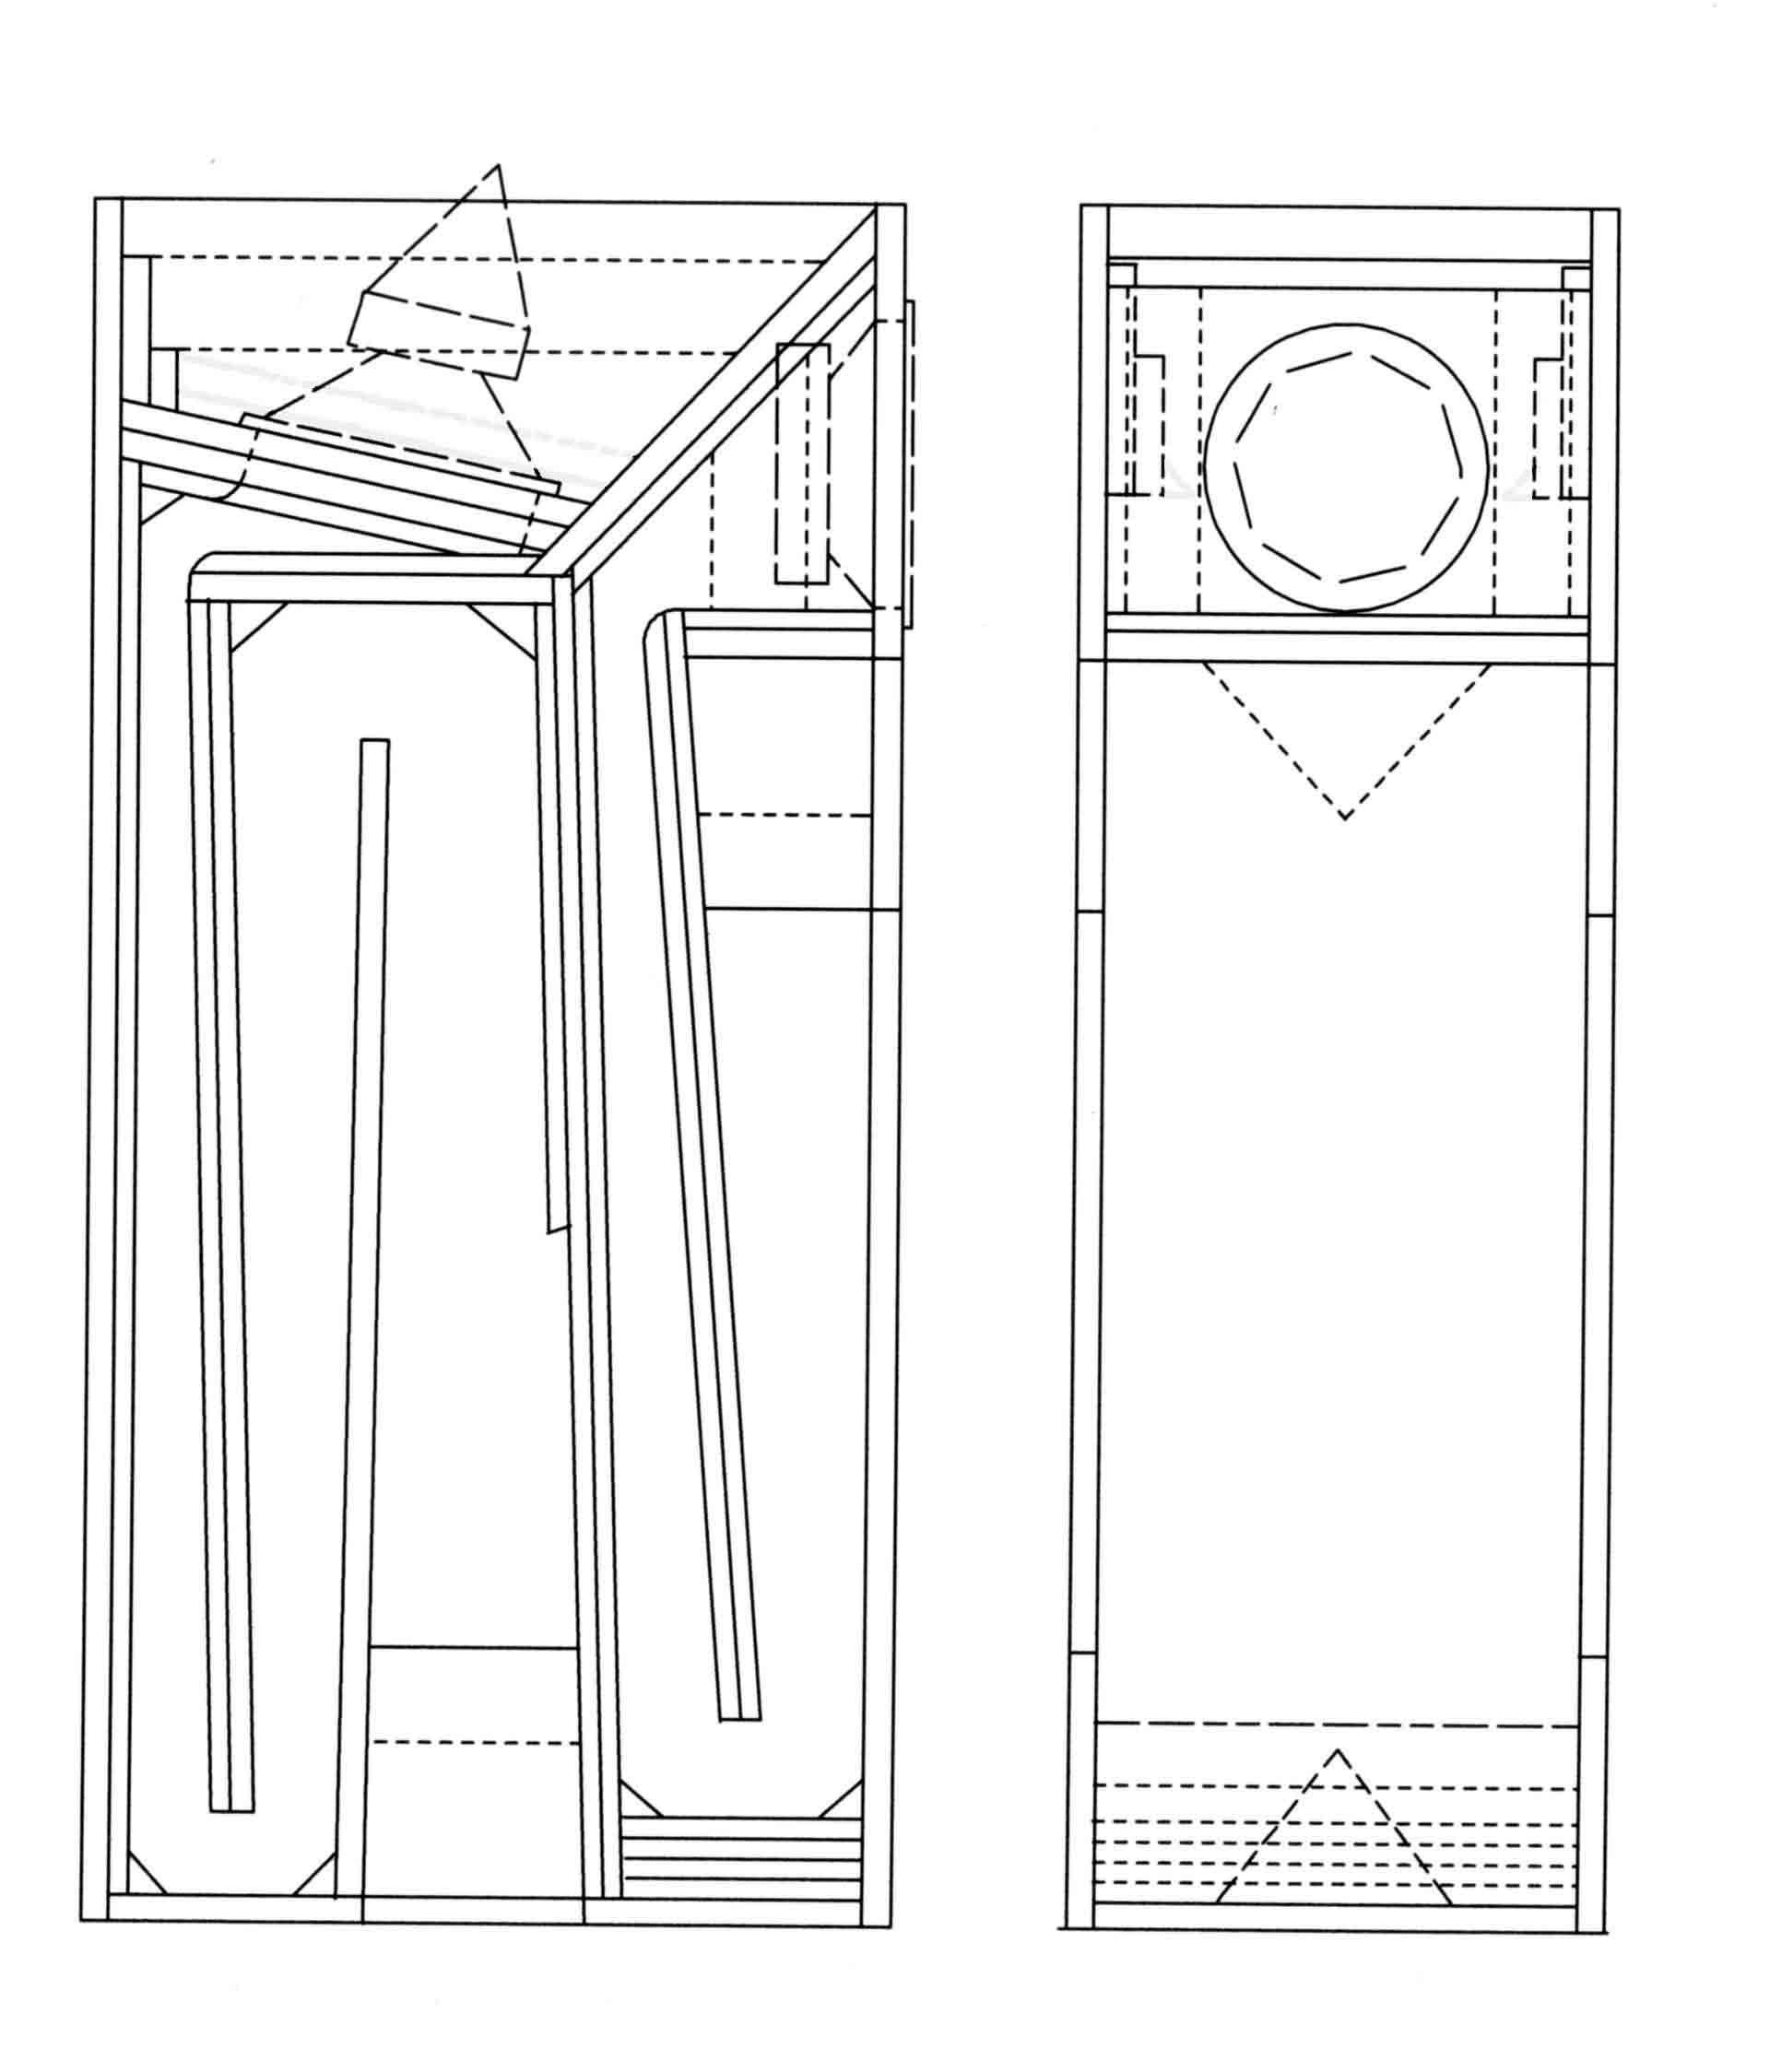 bildname diy dreams of spl 600 pins speaker box design open baffle speakers speaker plans. Black Bedroom Furniture Sets. Home Design Ideas